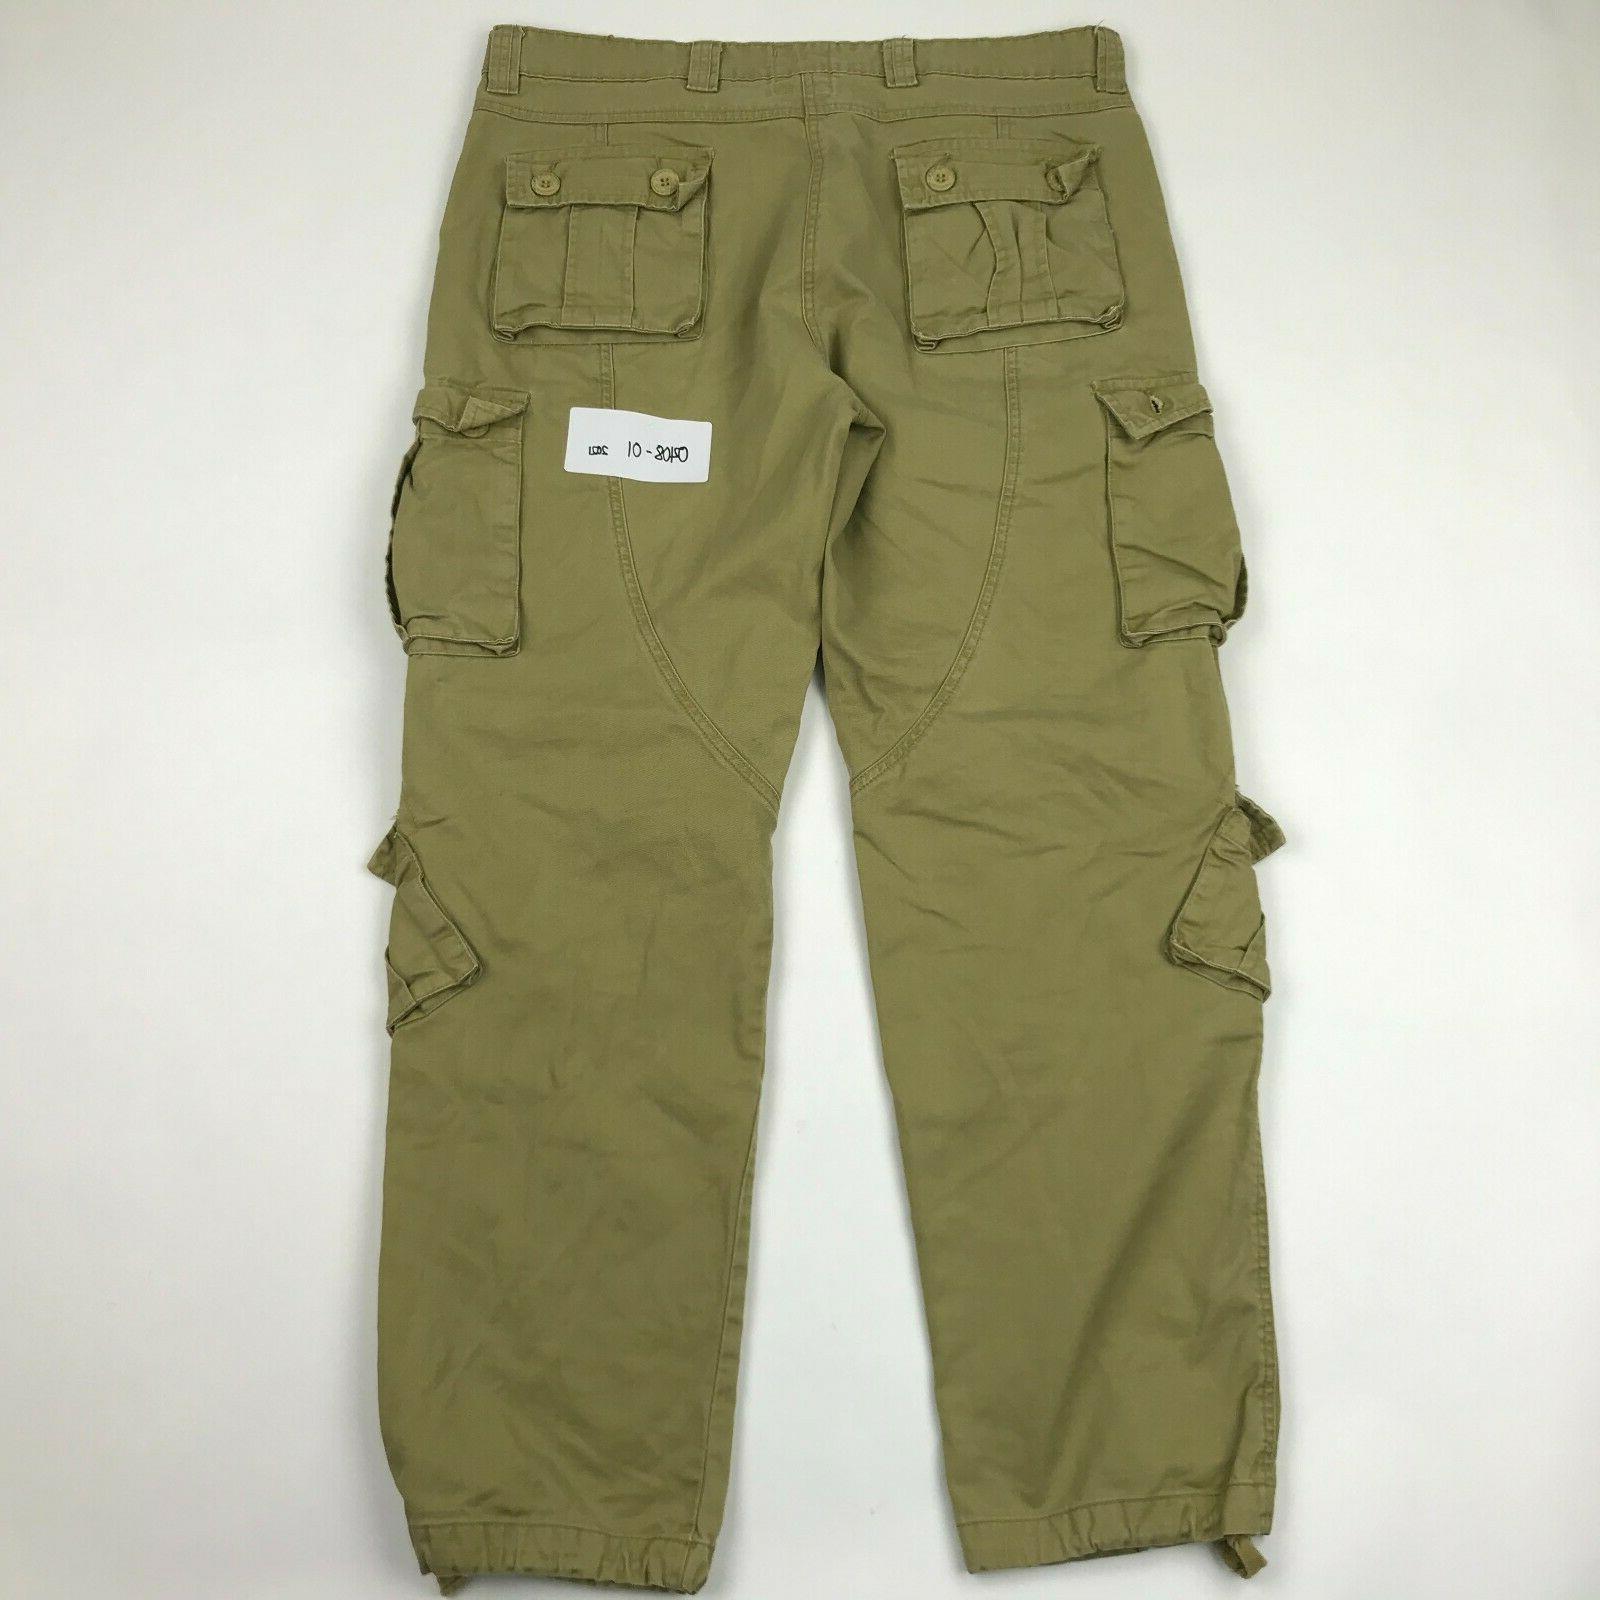 Must Way 8 Pockets Tactical Cargo sz 36